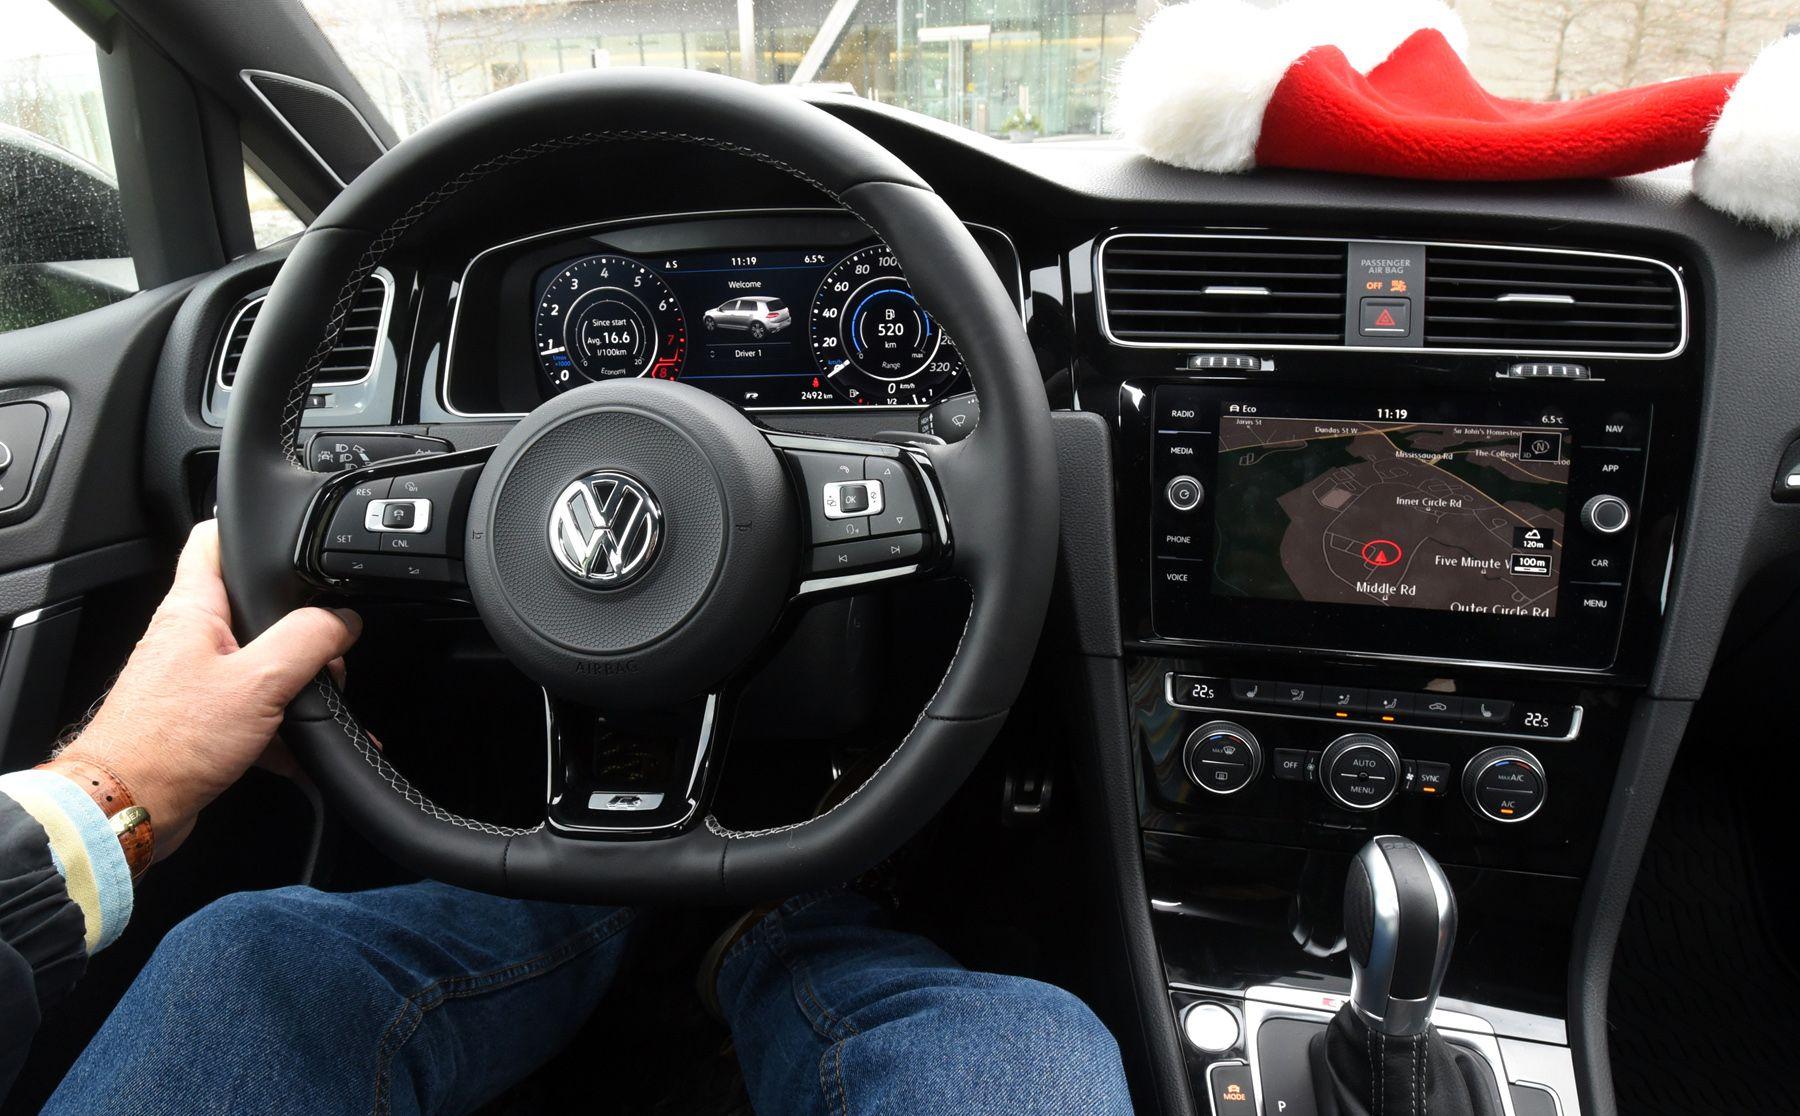 VW-Golf-R-2018-interior.jpg 1,800×1,116 pixels | Automobile | Pinterest